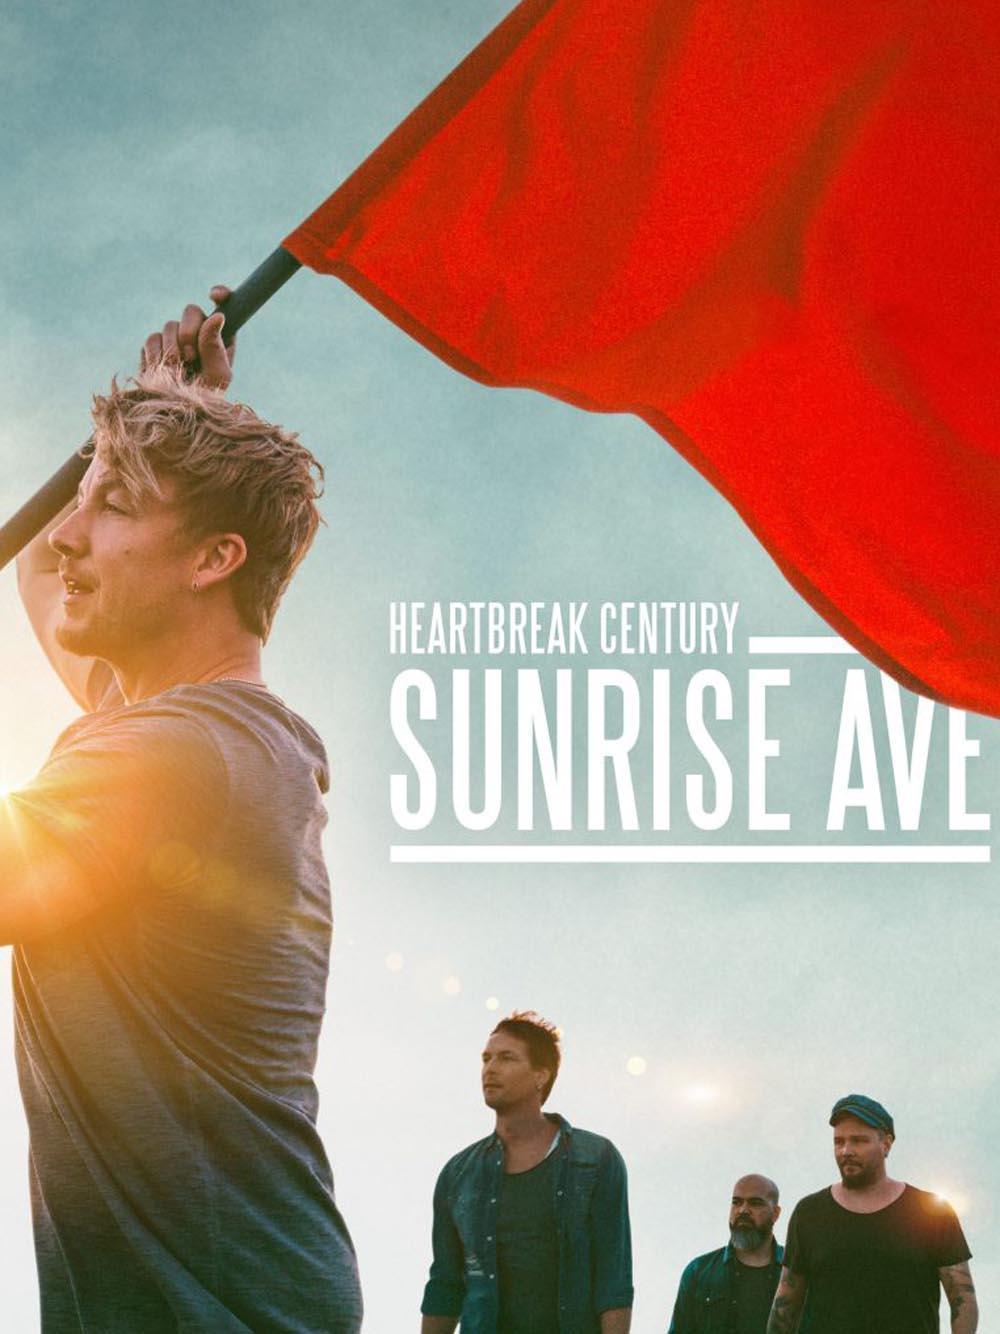 sunrise-avenue_heartbreak-century_albumcover